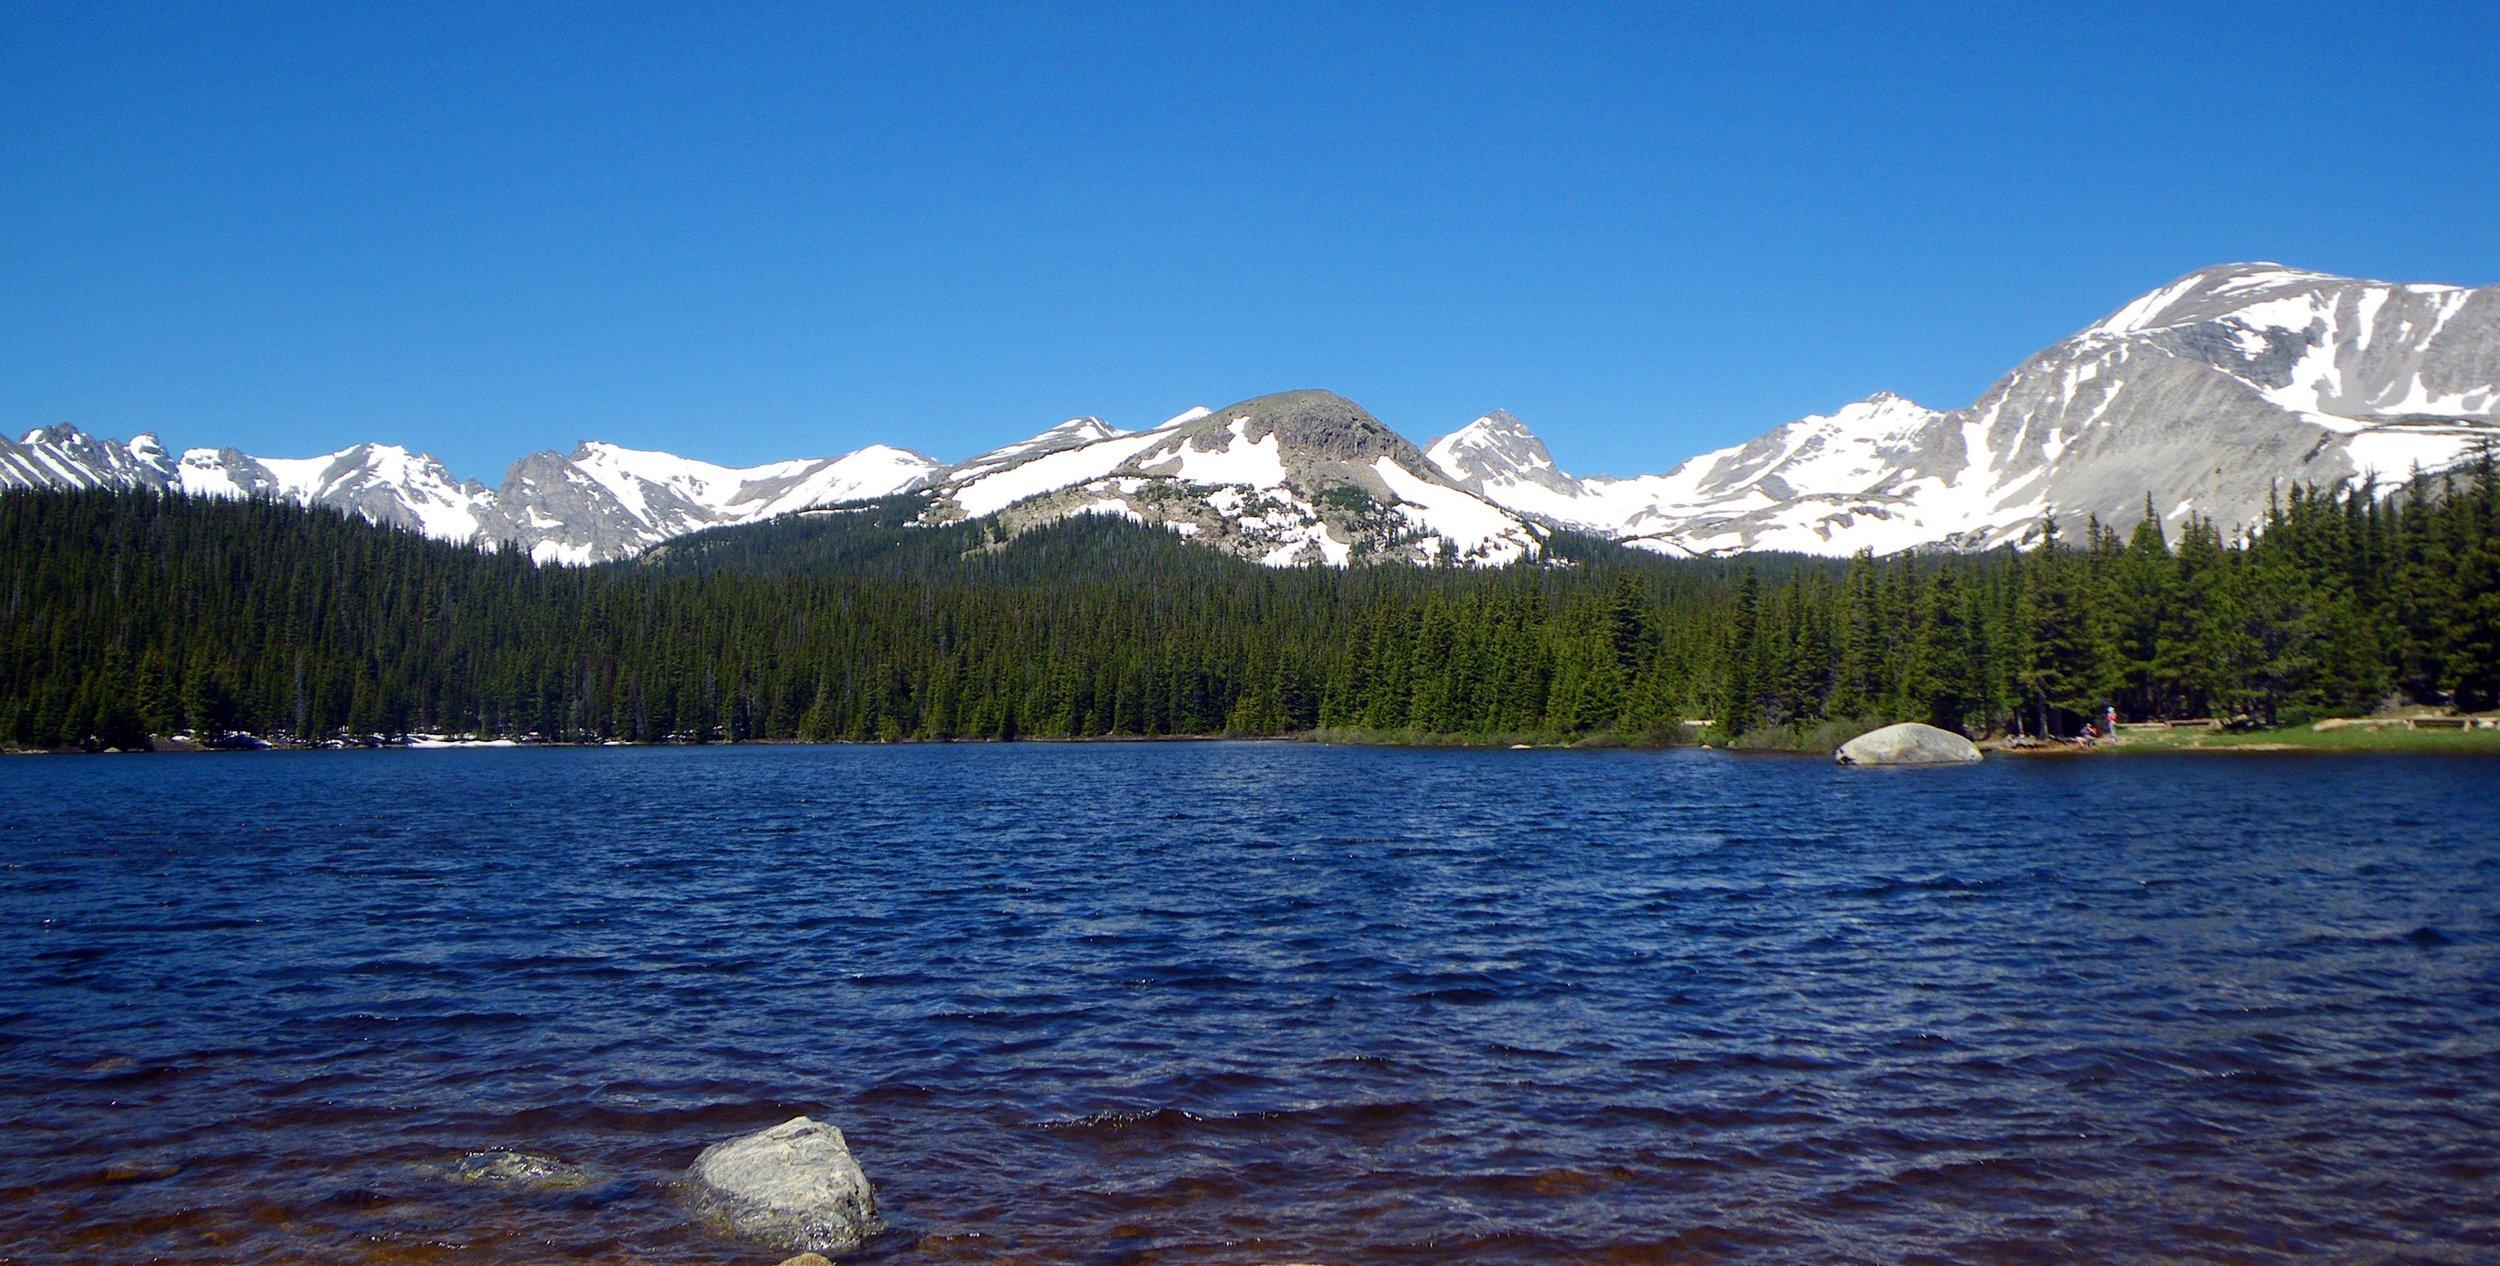 Brainard Lake, Co - Photo by Tim Giller